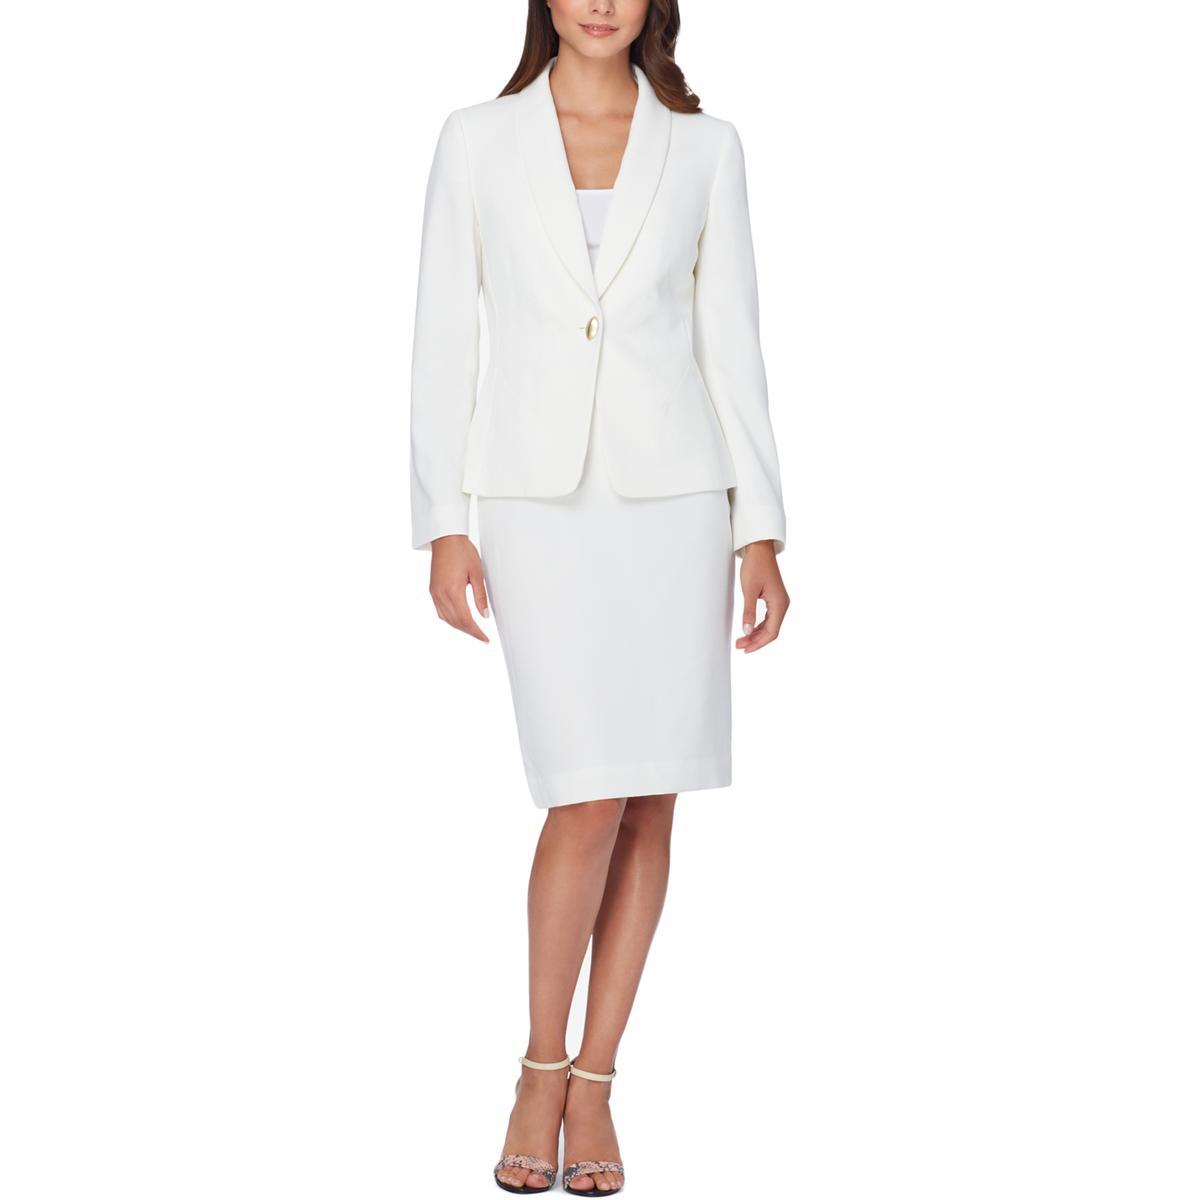 d1bc1cda9cec Details about Tahari ASL Womens Ivory 2PC Office Wear Business Skirt Suit 2  BHFO 2223